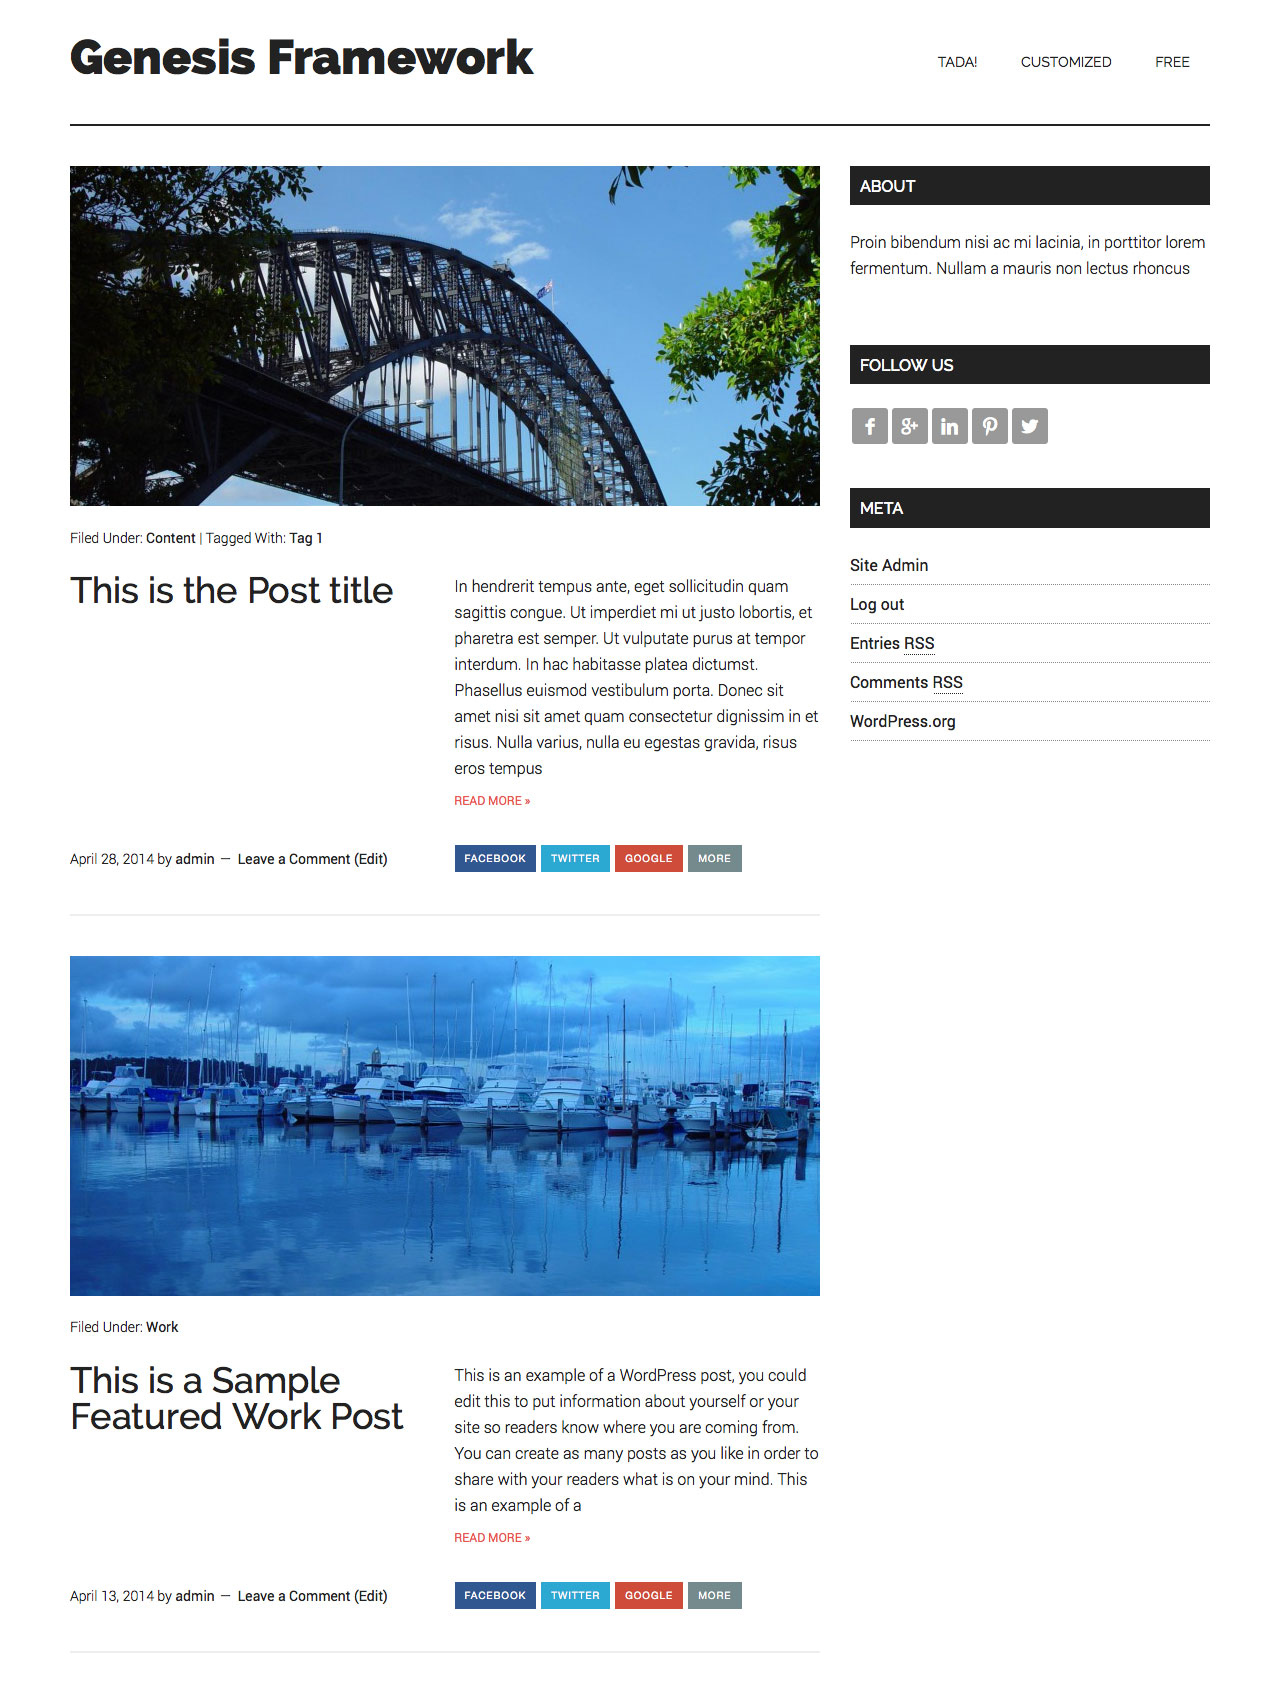 fastcompany-like-layout-multiple-posts